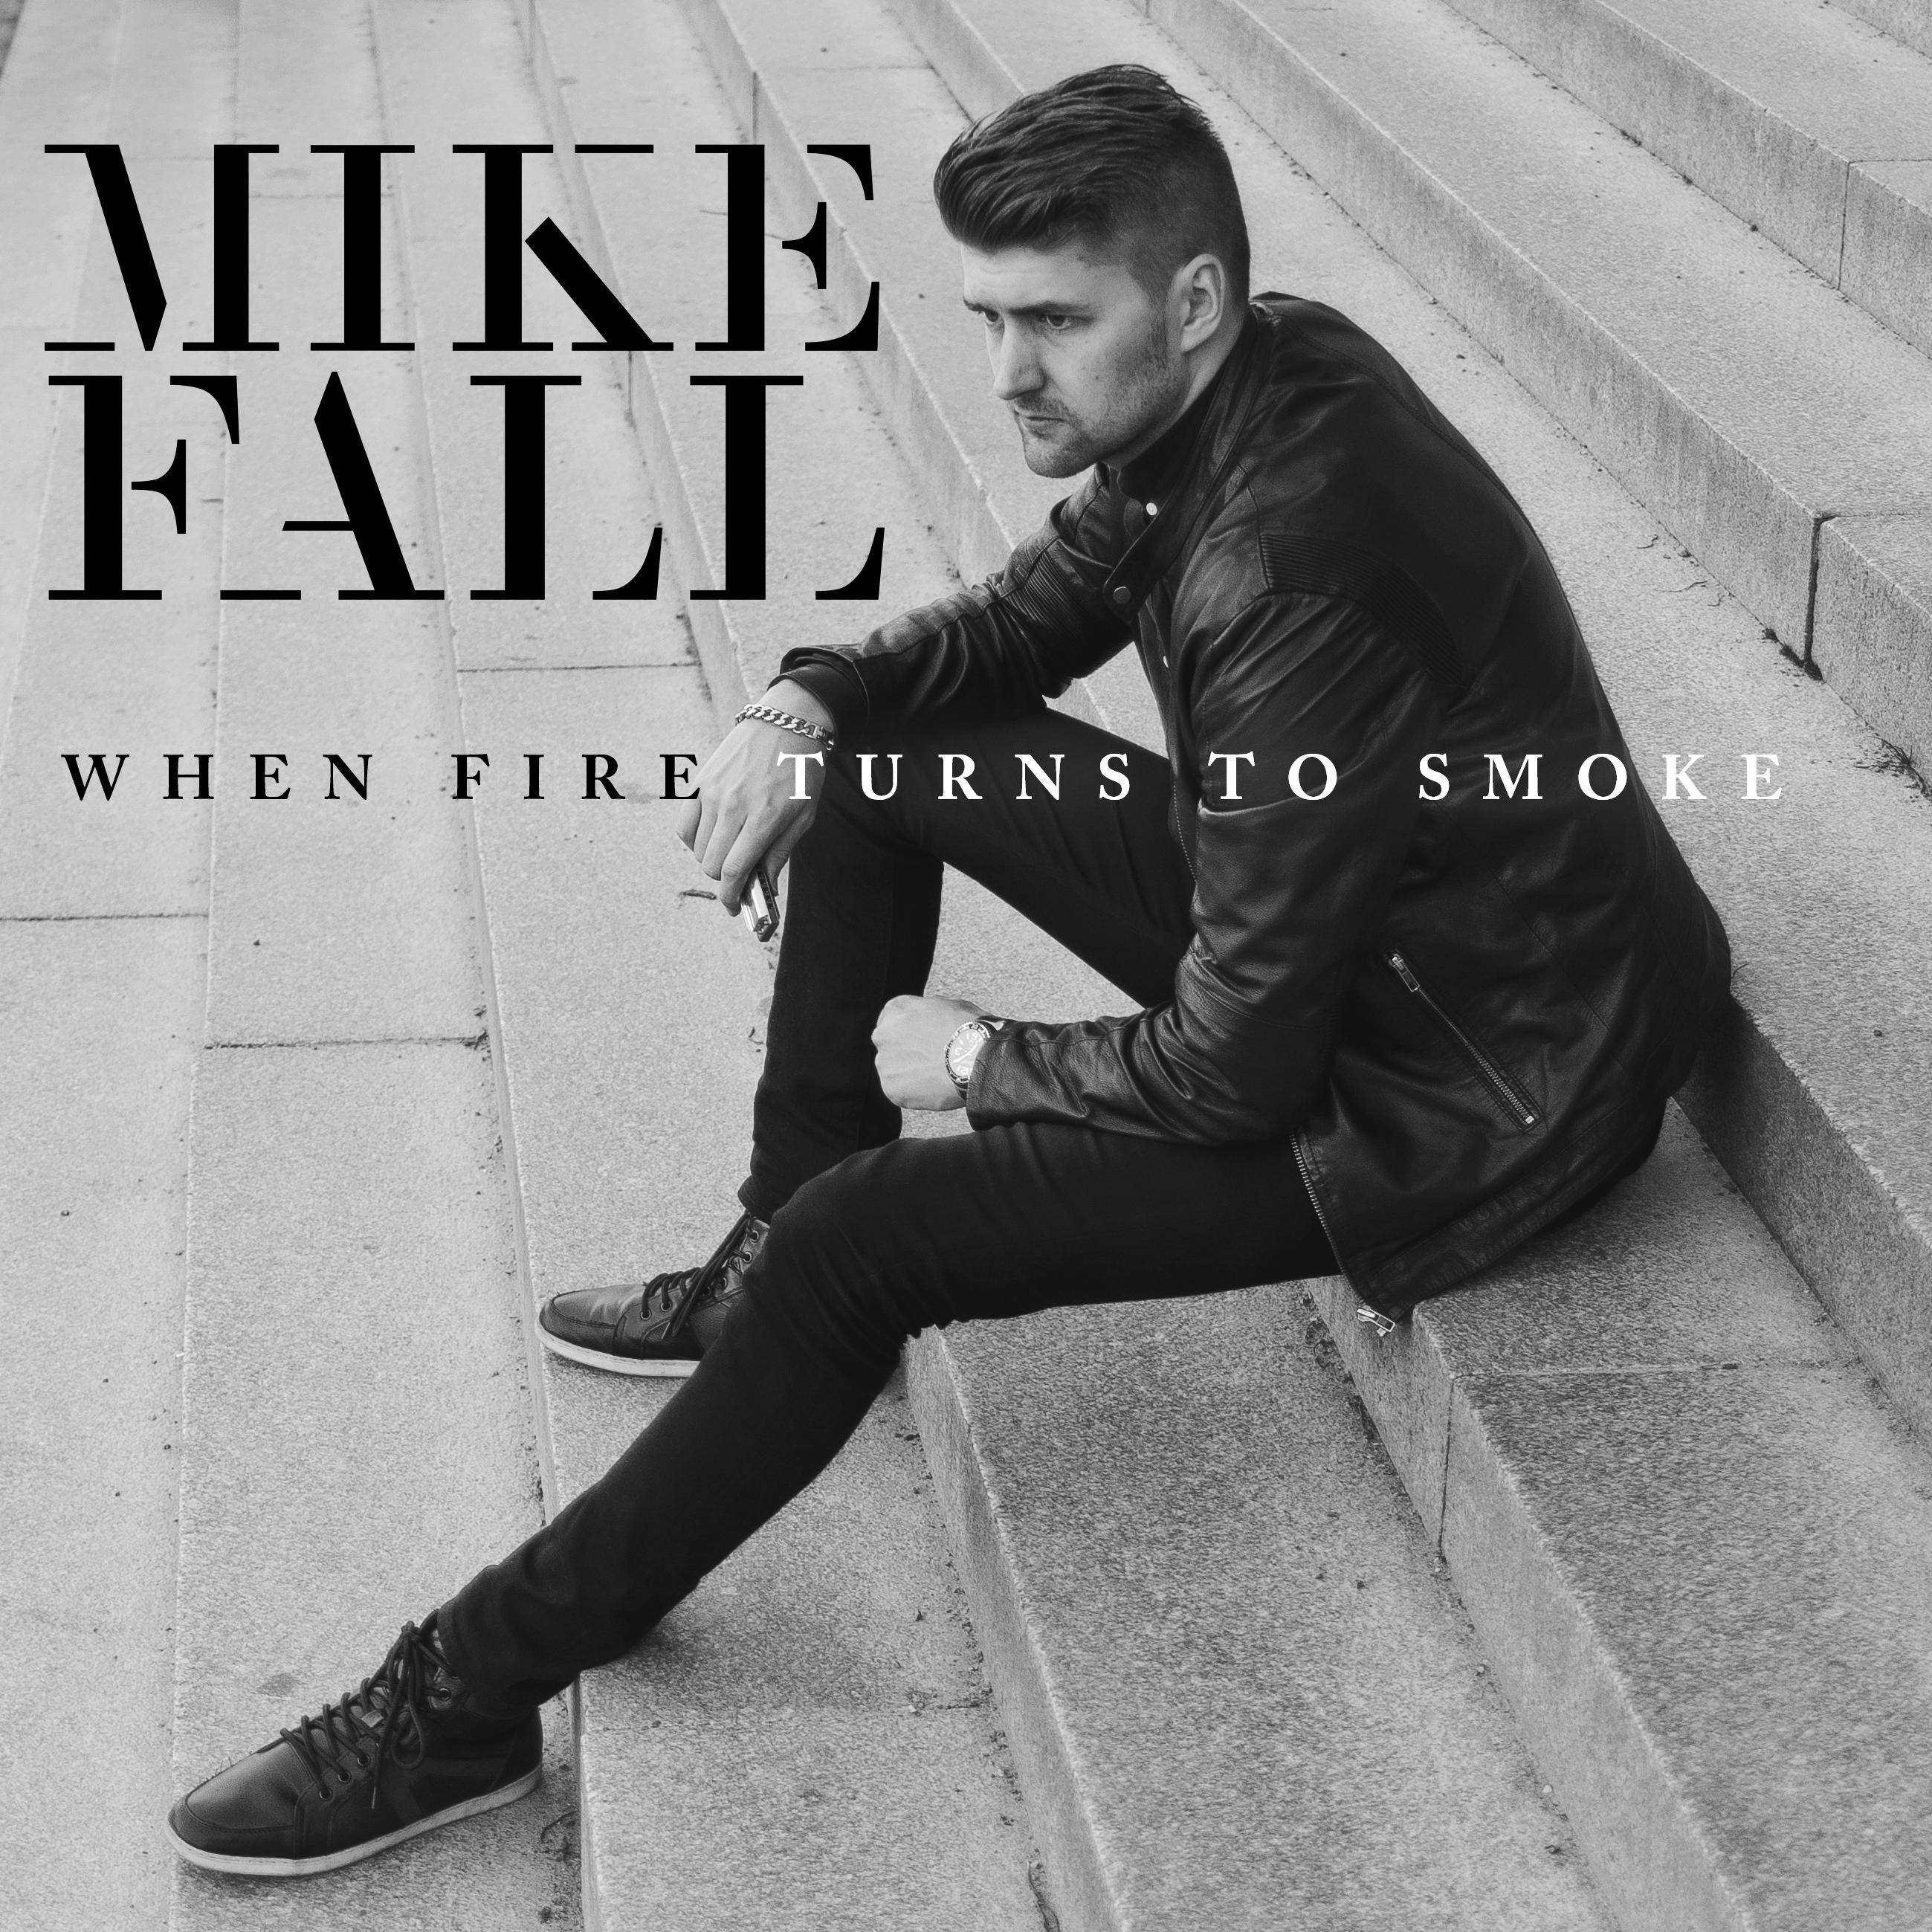 Mike Fall - When Fire Turns To Smoke